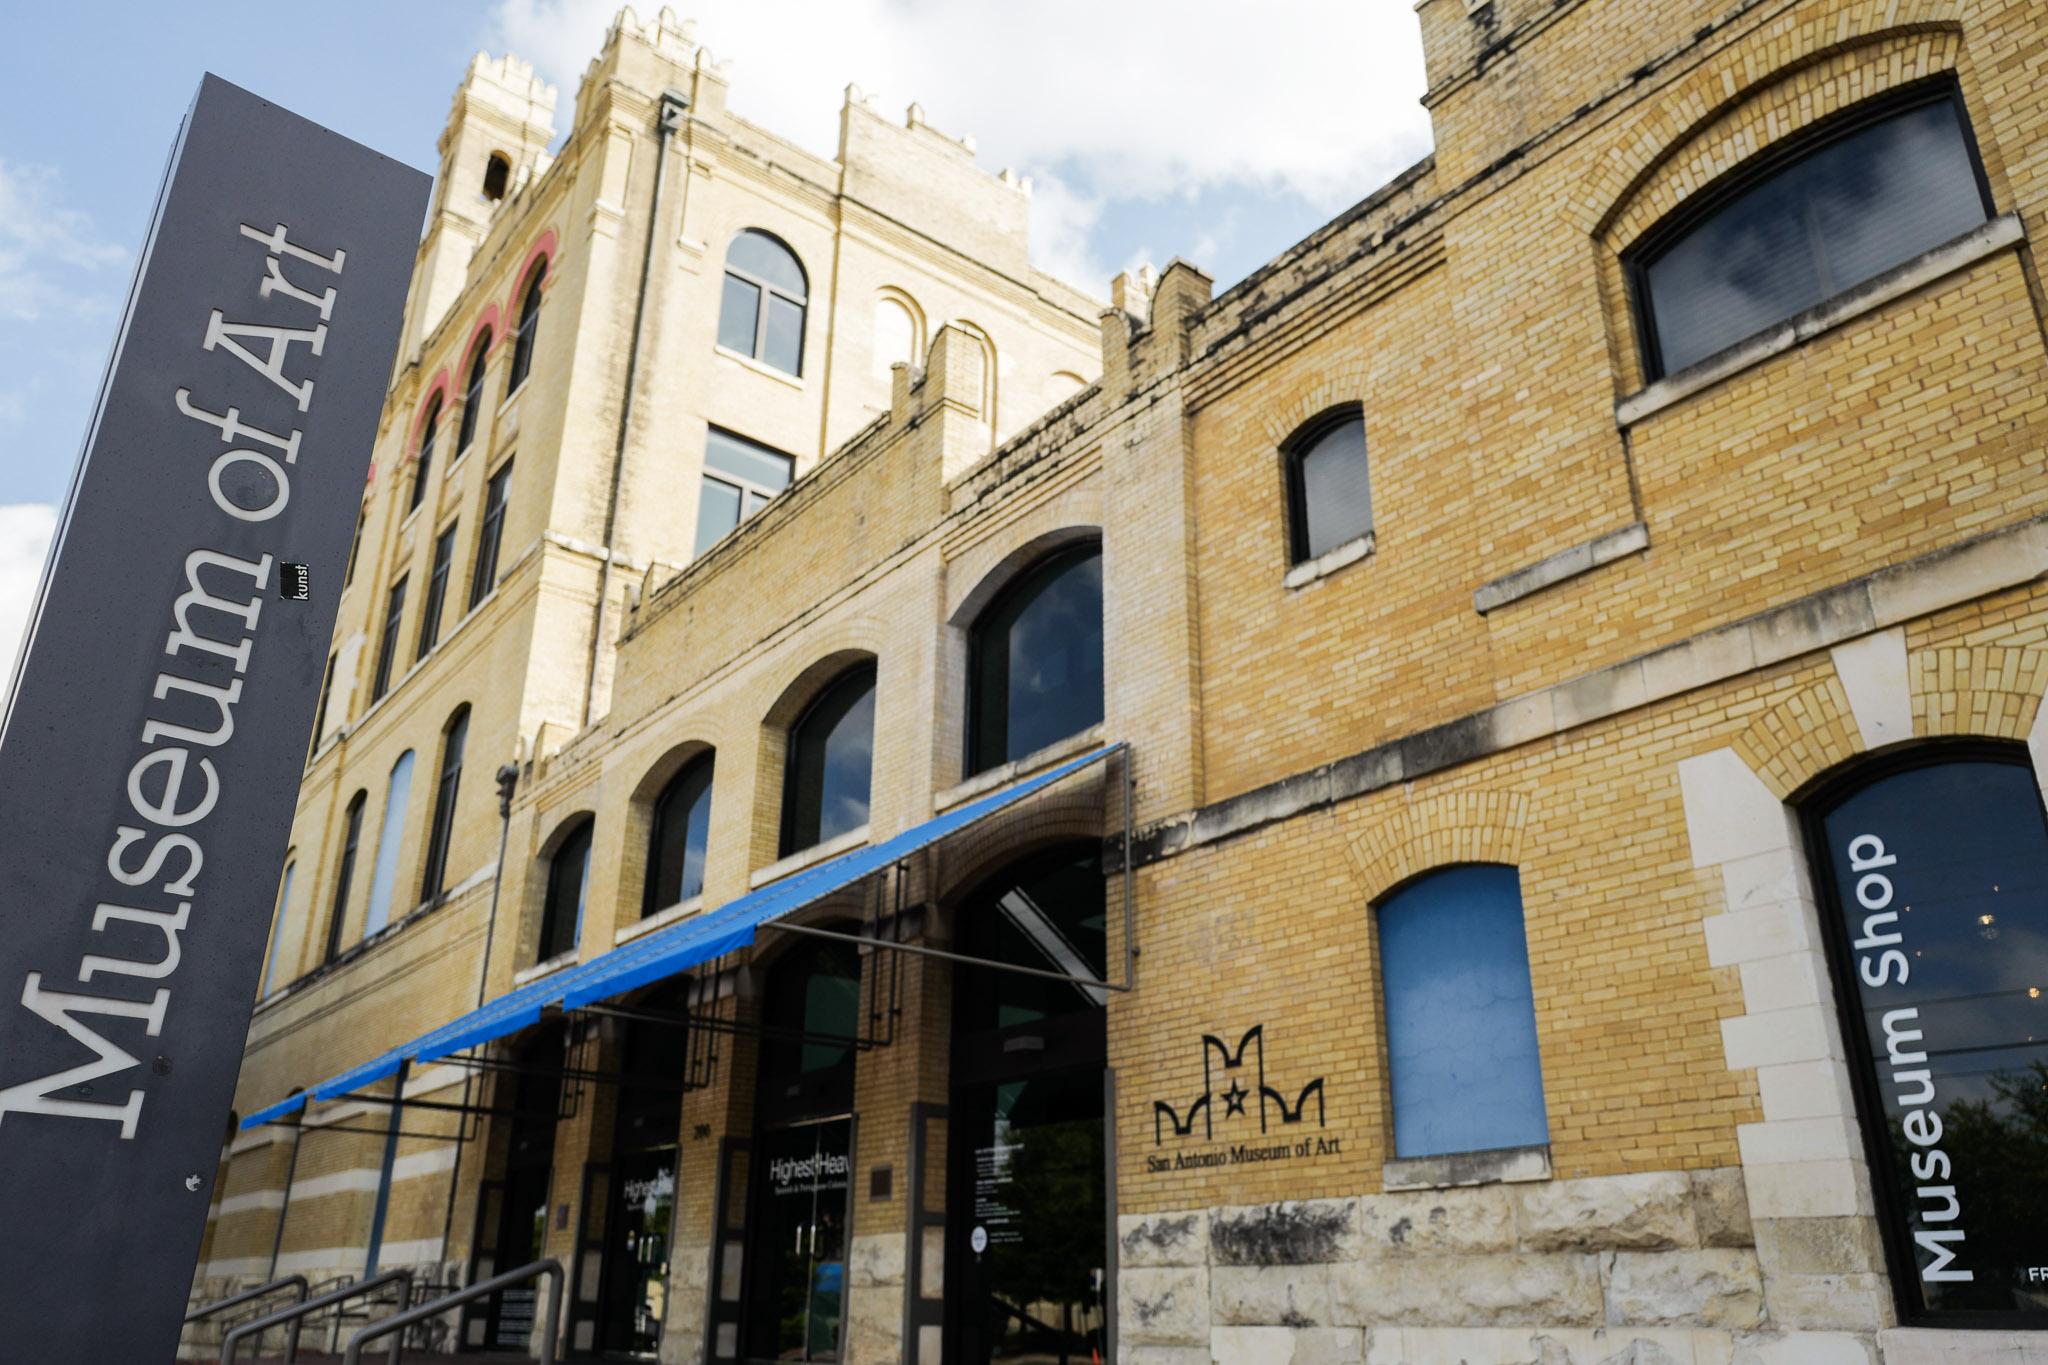 San Antonio Museum of Art at 200 W. Jones Ave. Photo by Scott Ball.